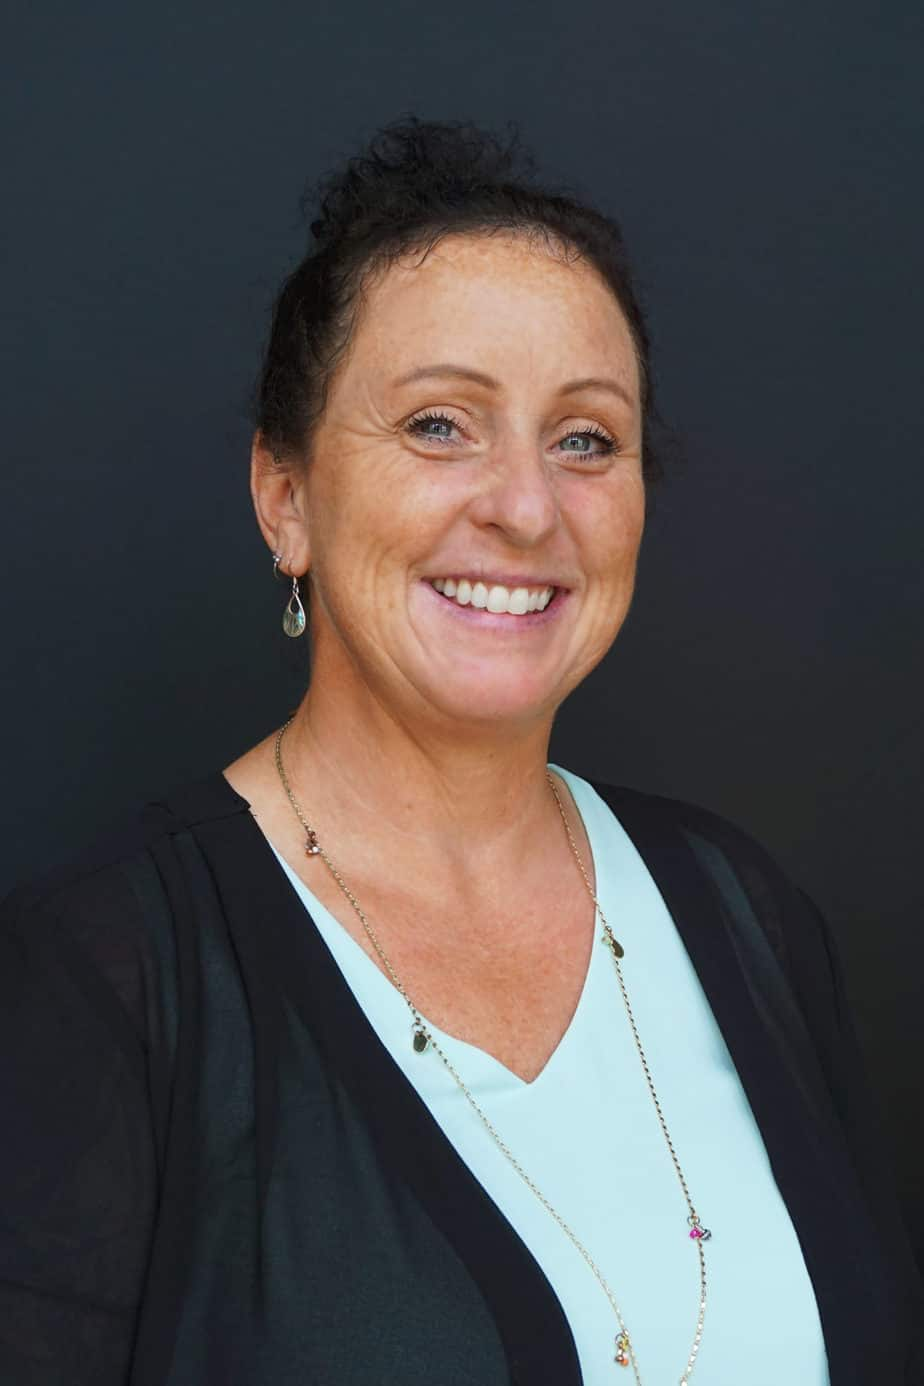 Christy Coppenbarger